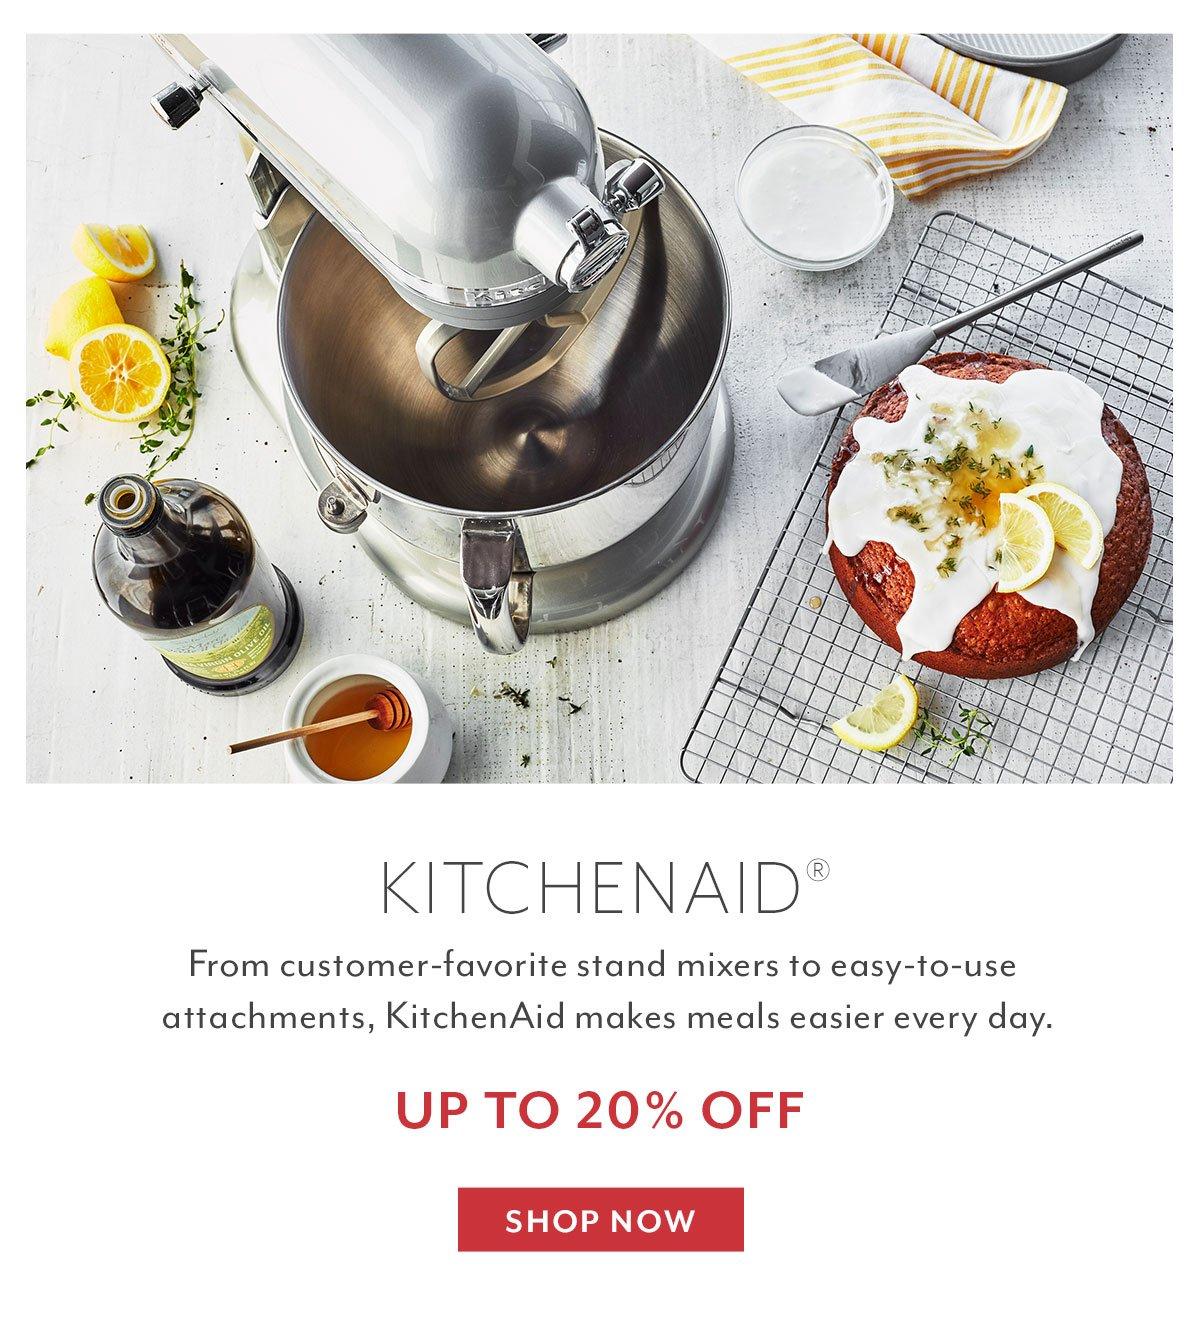 Kitchenaid